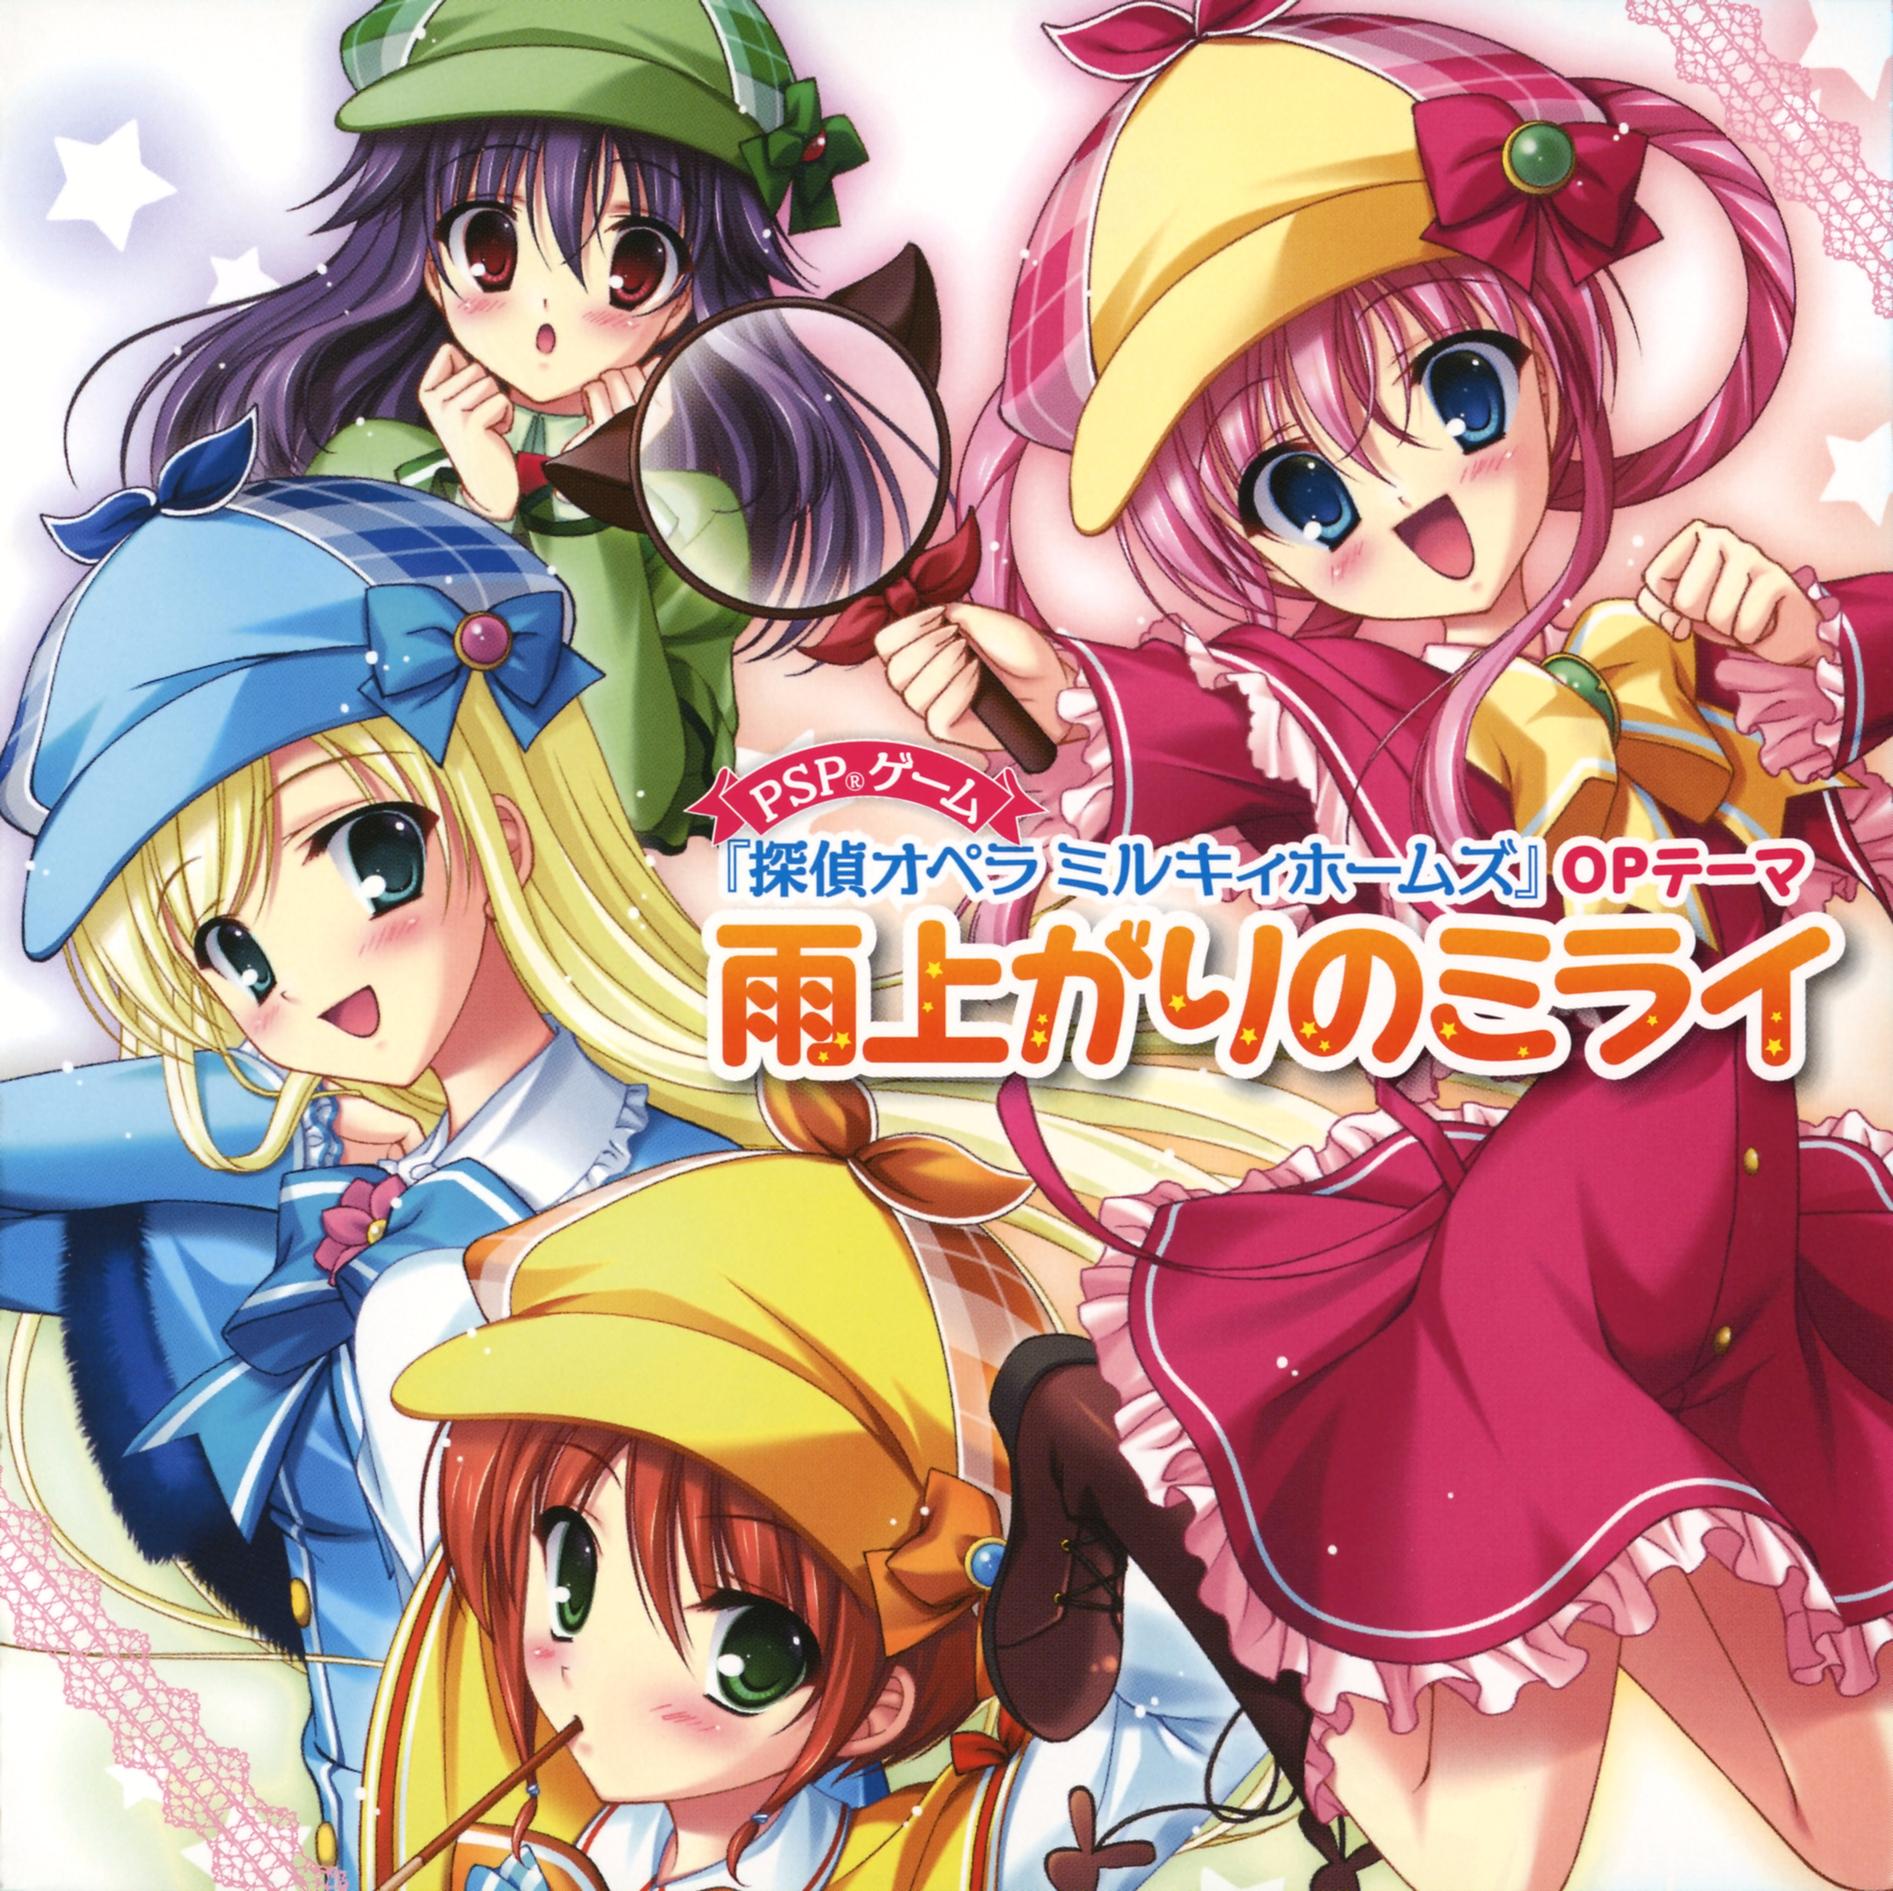 Tantei Opera Milky Holmes - JapanpopcultureHQ